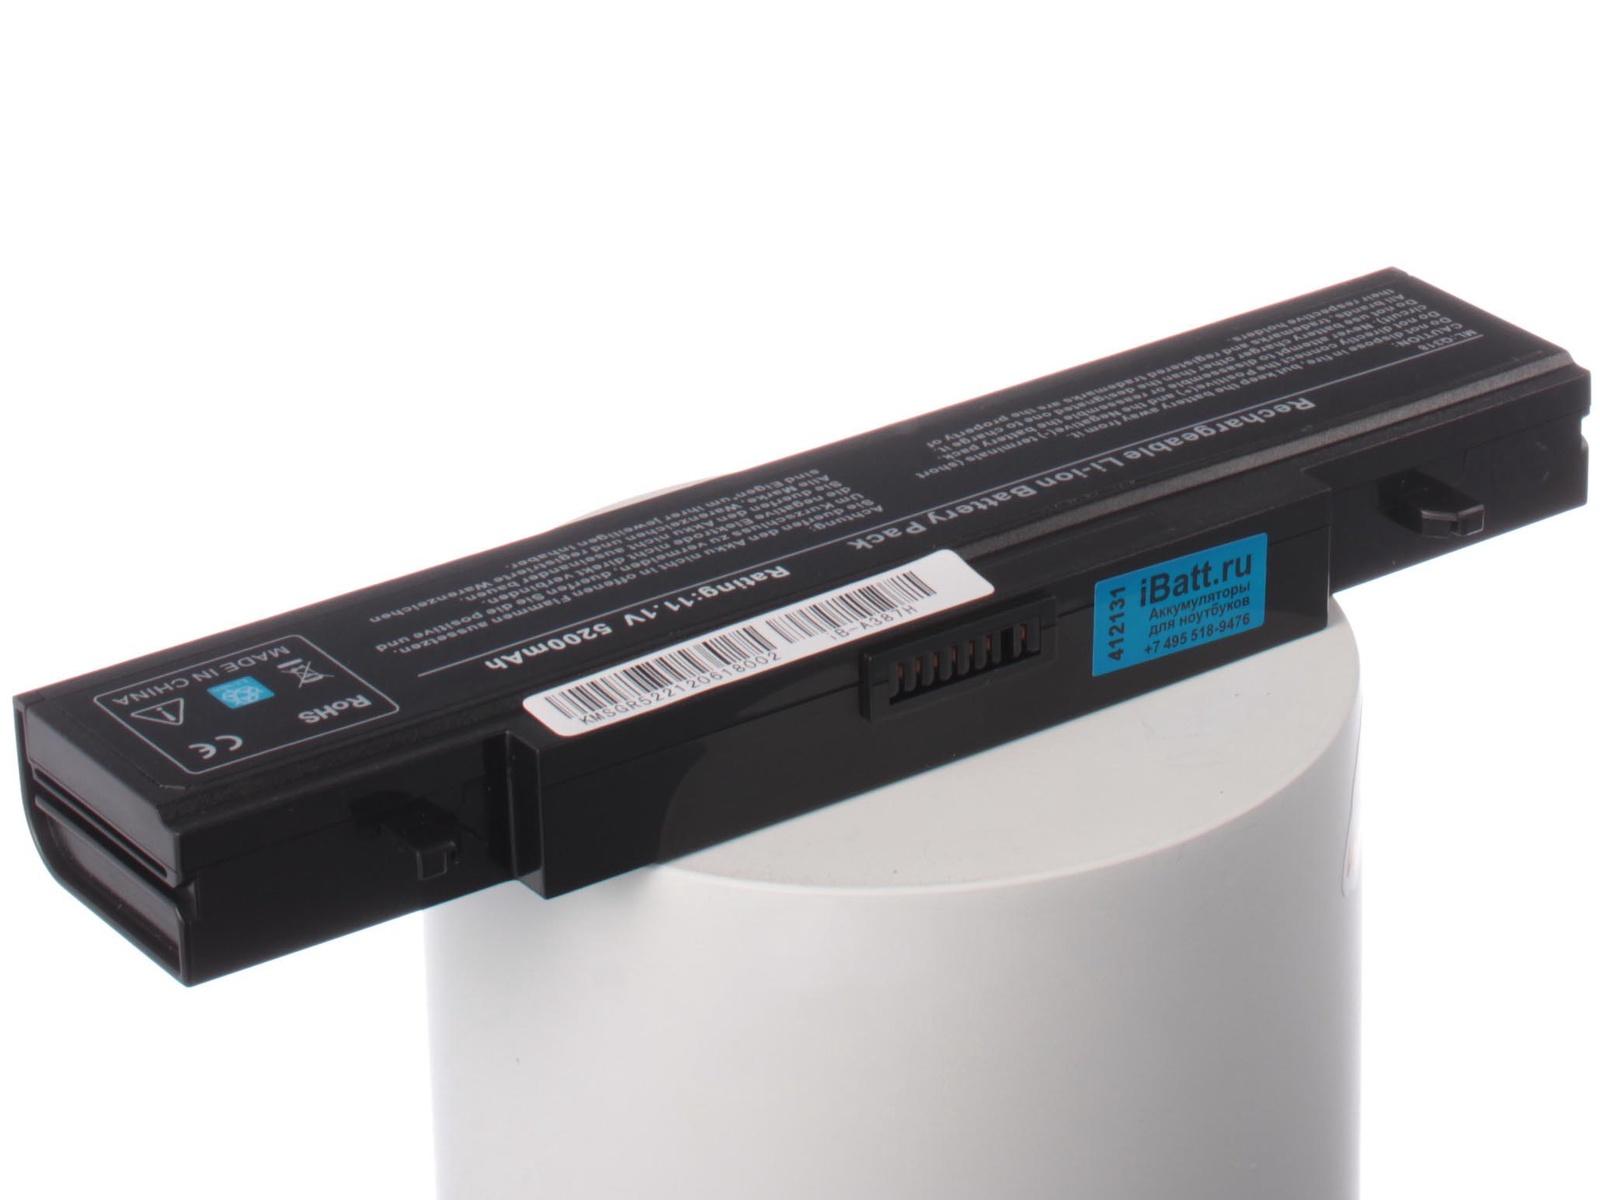 Аккумулятор для ноутбука iBatt для Samsung 300V5A-S0X, 350E5C-S0A, NP-R509, 300E5C-A01, 300E5C-U06, 300V5A-S16, NP-RV410, RV513-A01, 355V5C-S0E, 355E5C-A04, 300E5C-U02, RV520-S04, 300E5Z-S04, 300V5A-S1B, RC730-S01, 300V4A-A05 аккумулятор для ноутбука anybatt для samsung 300v5a s05 300v5a s0j 300v5a s0s 300v5a s0t 300v5a s0v 305v5a s0b 310e5c a01 350e5c s0e 350e7c s0a 350v5c s0z 355v5c s0l ativ book 2 270e4e np r39 np r39 plus np r408